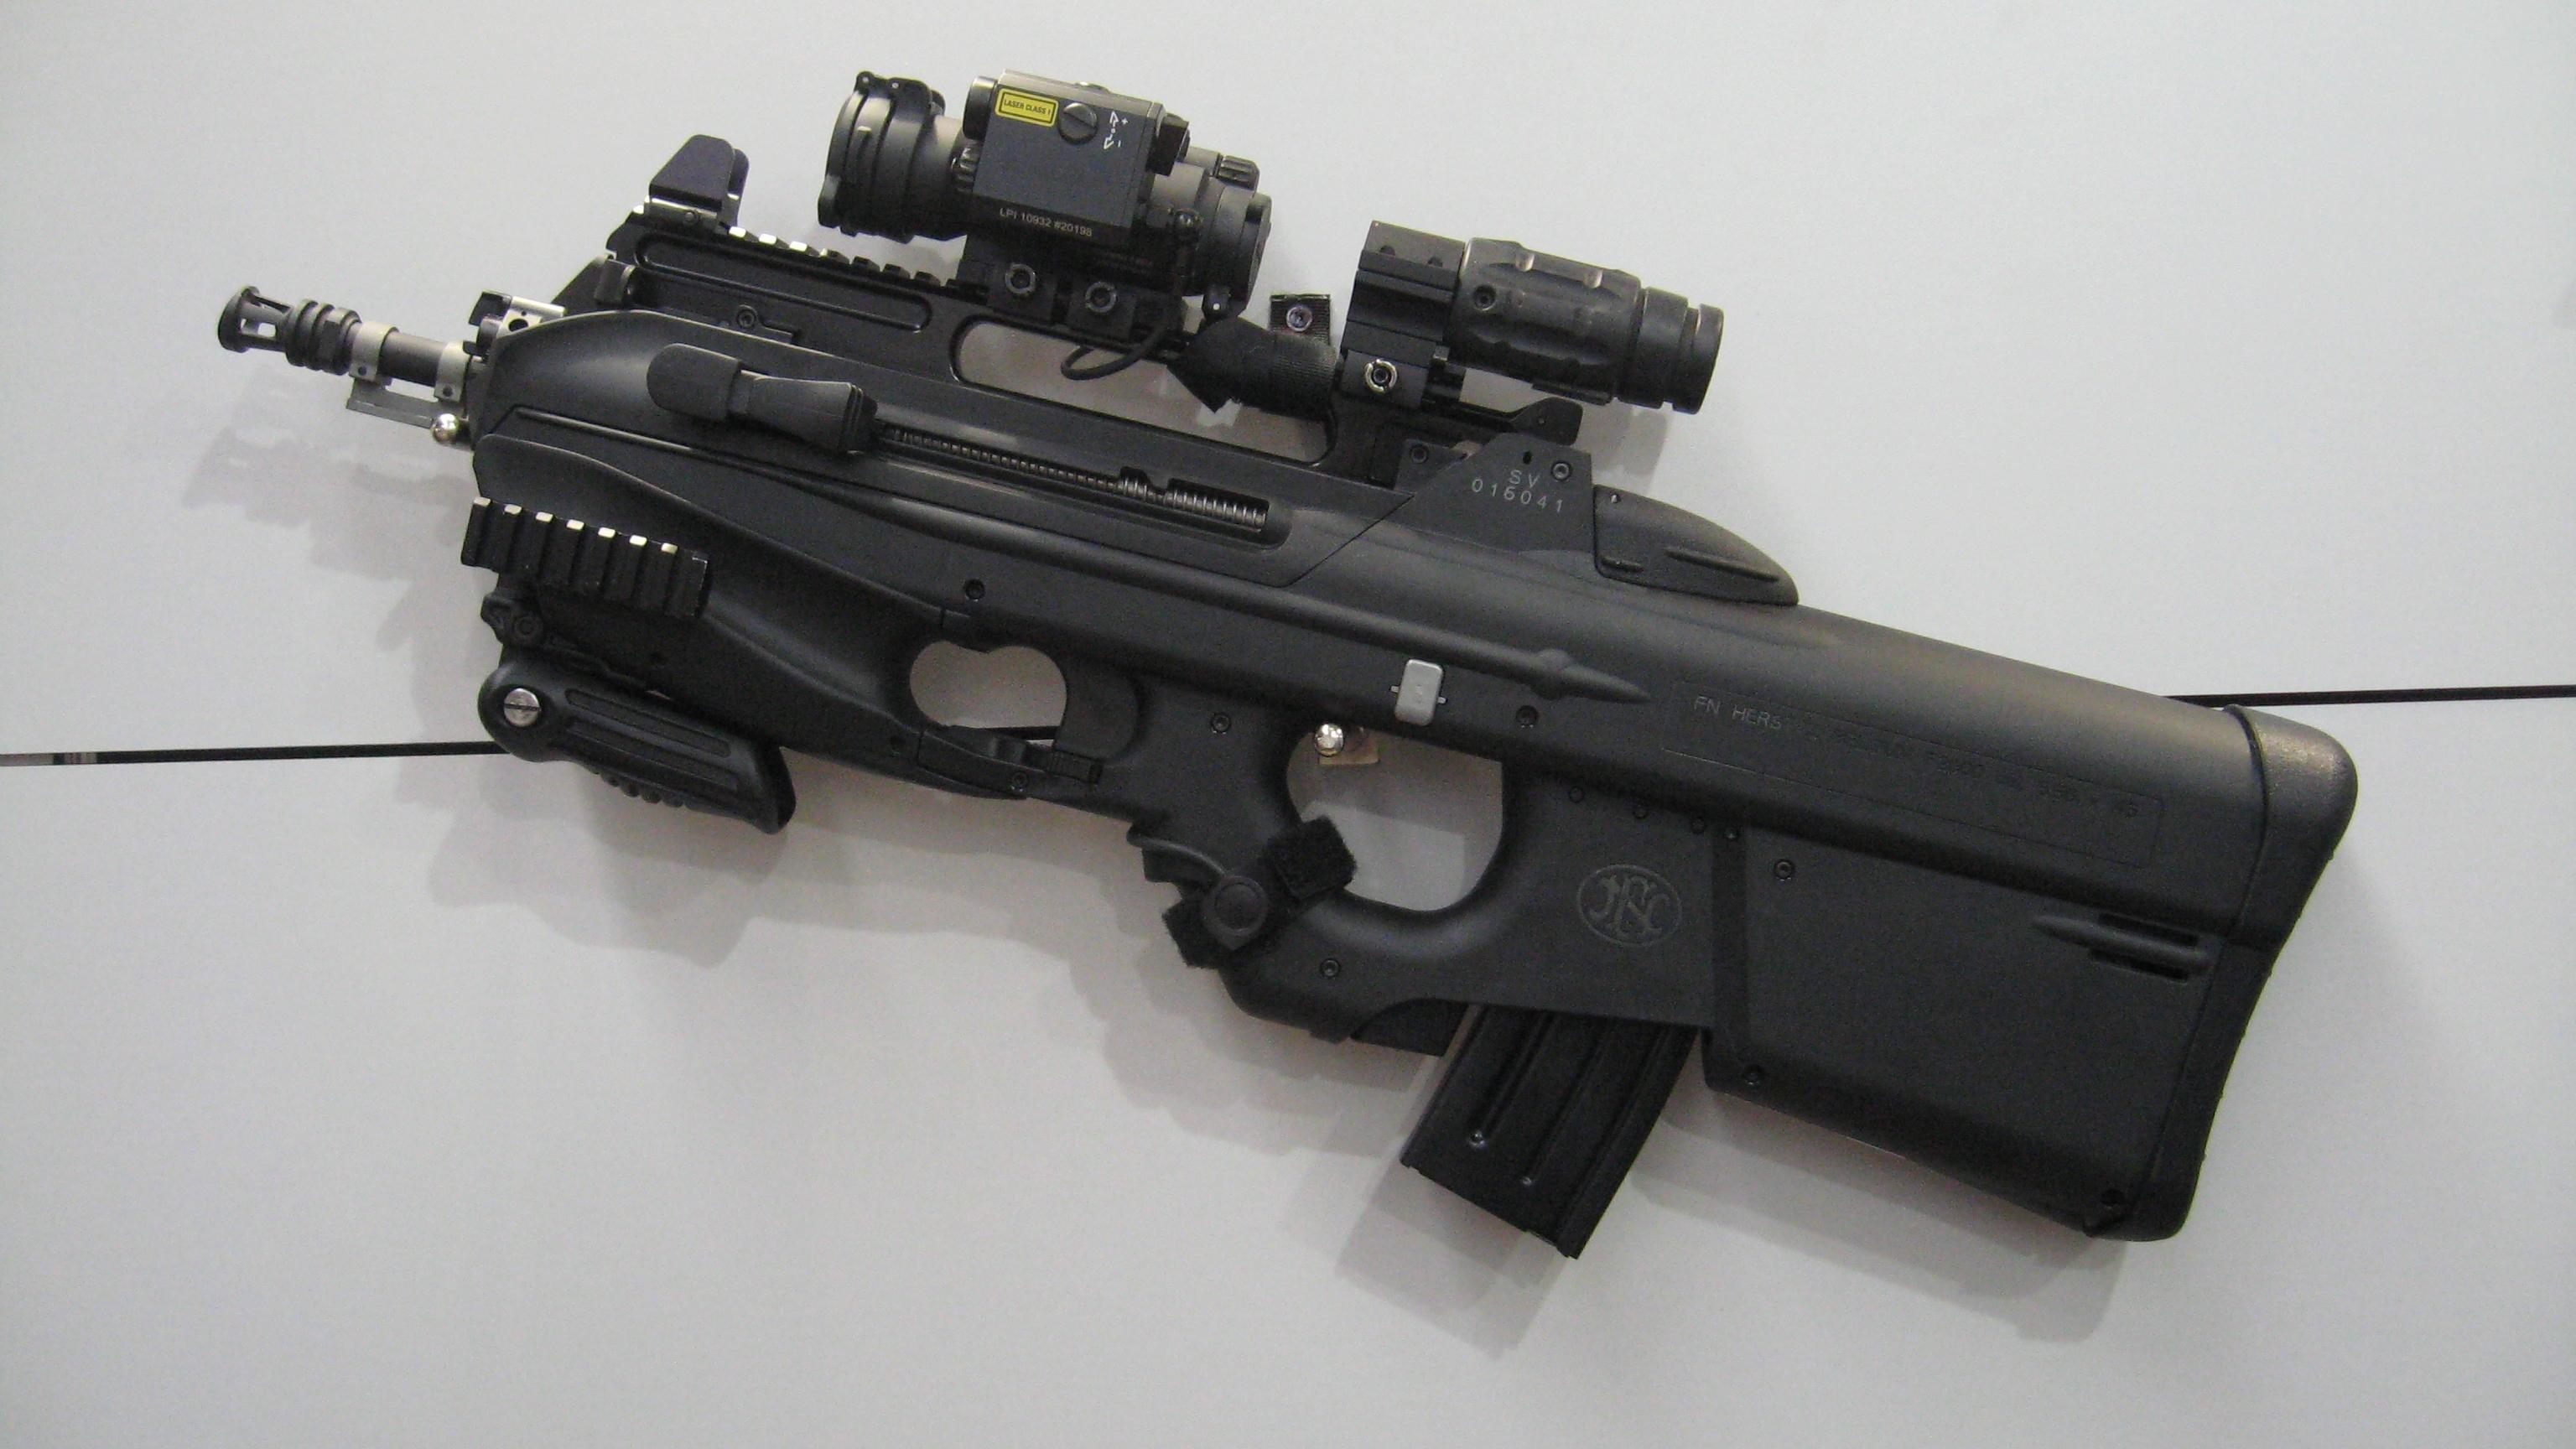 FN HERSTAL F 2000 Assault Rifle Weapon Gun Police Military 1 JPG Wallpaper